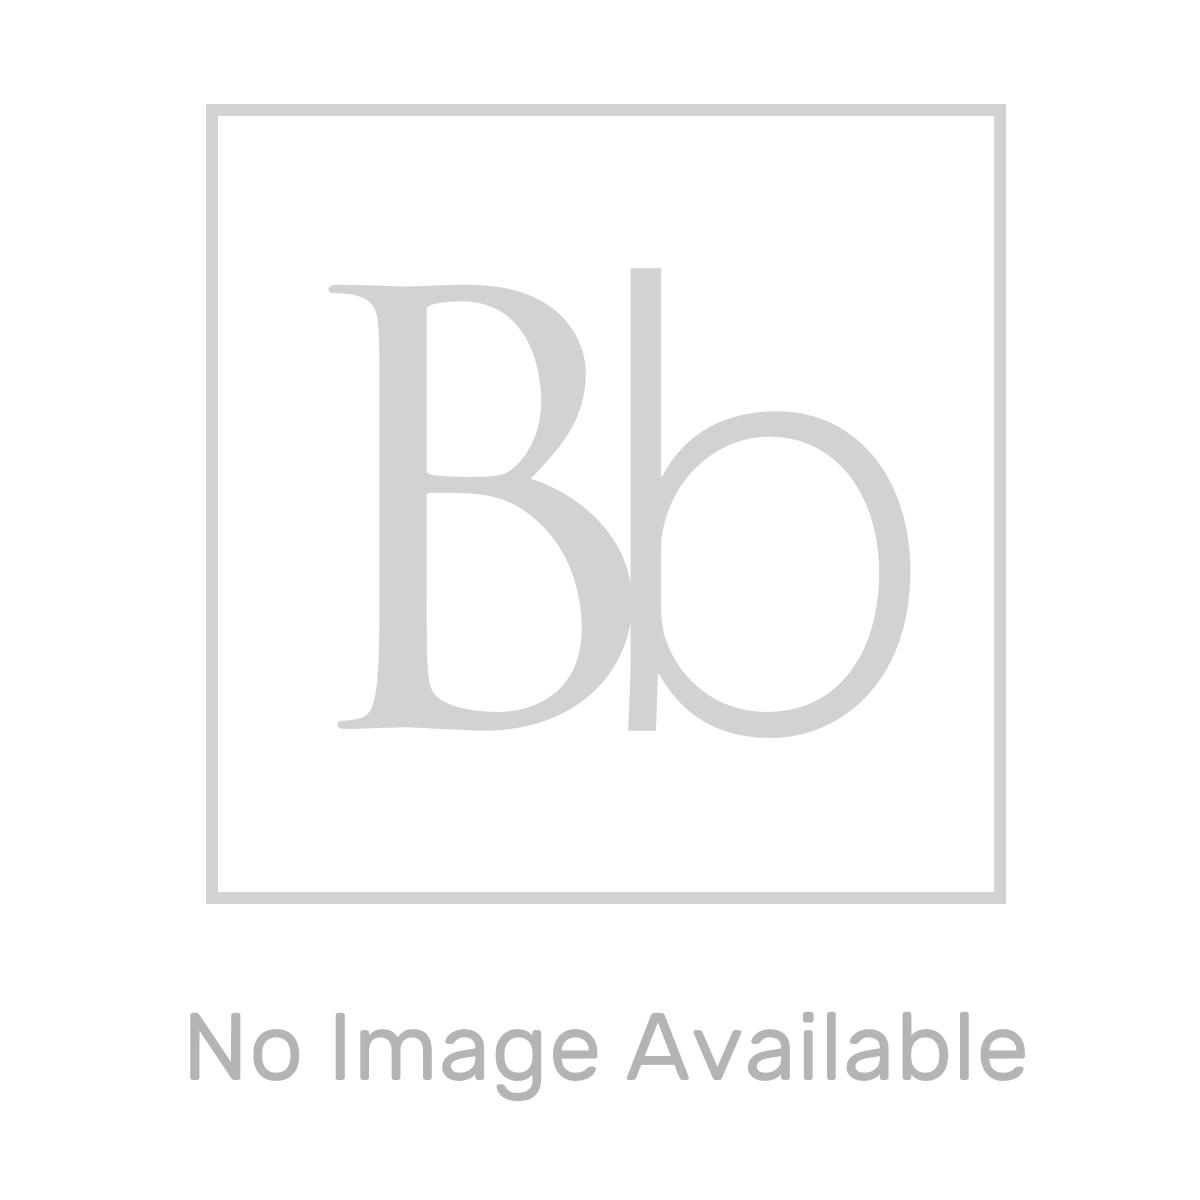 Moods Volta White Gloss End Panel 760mm